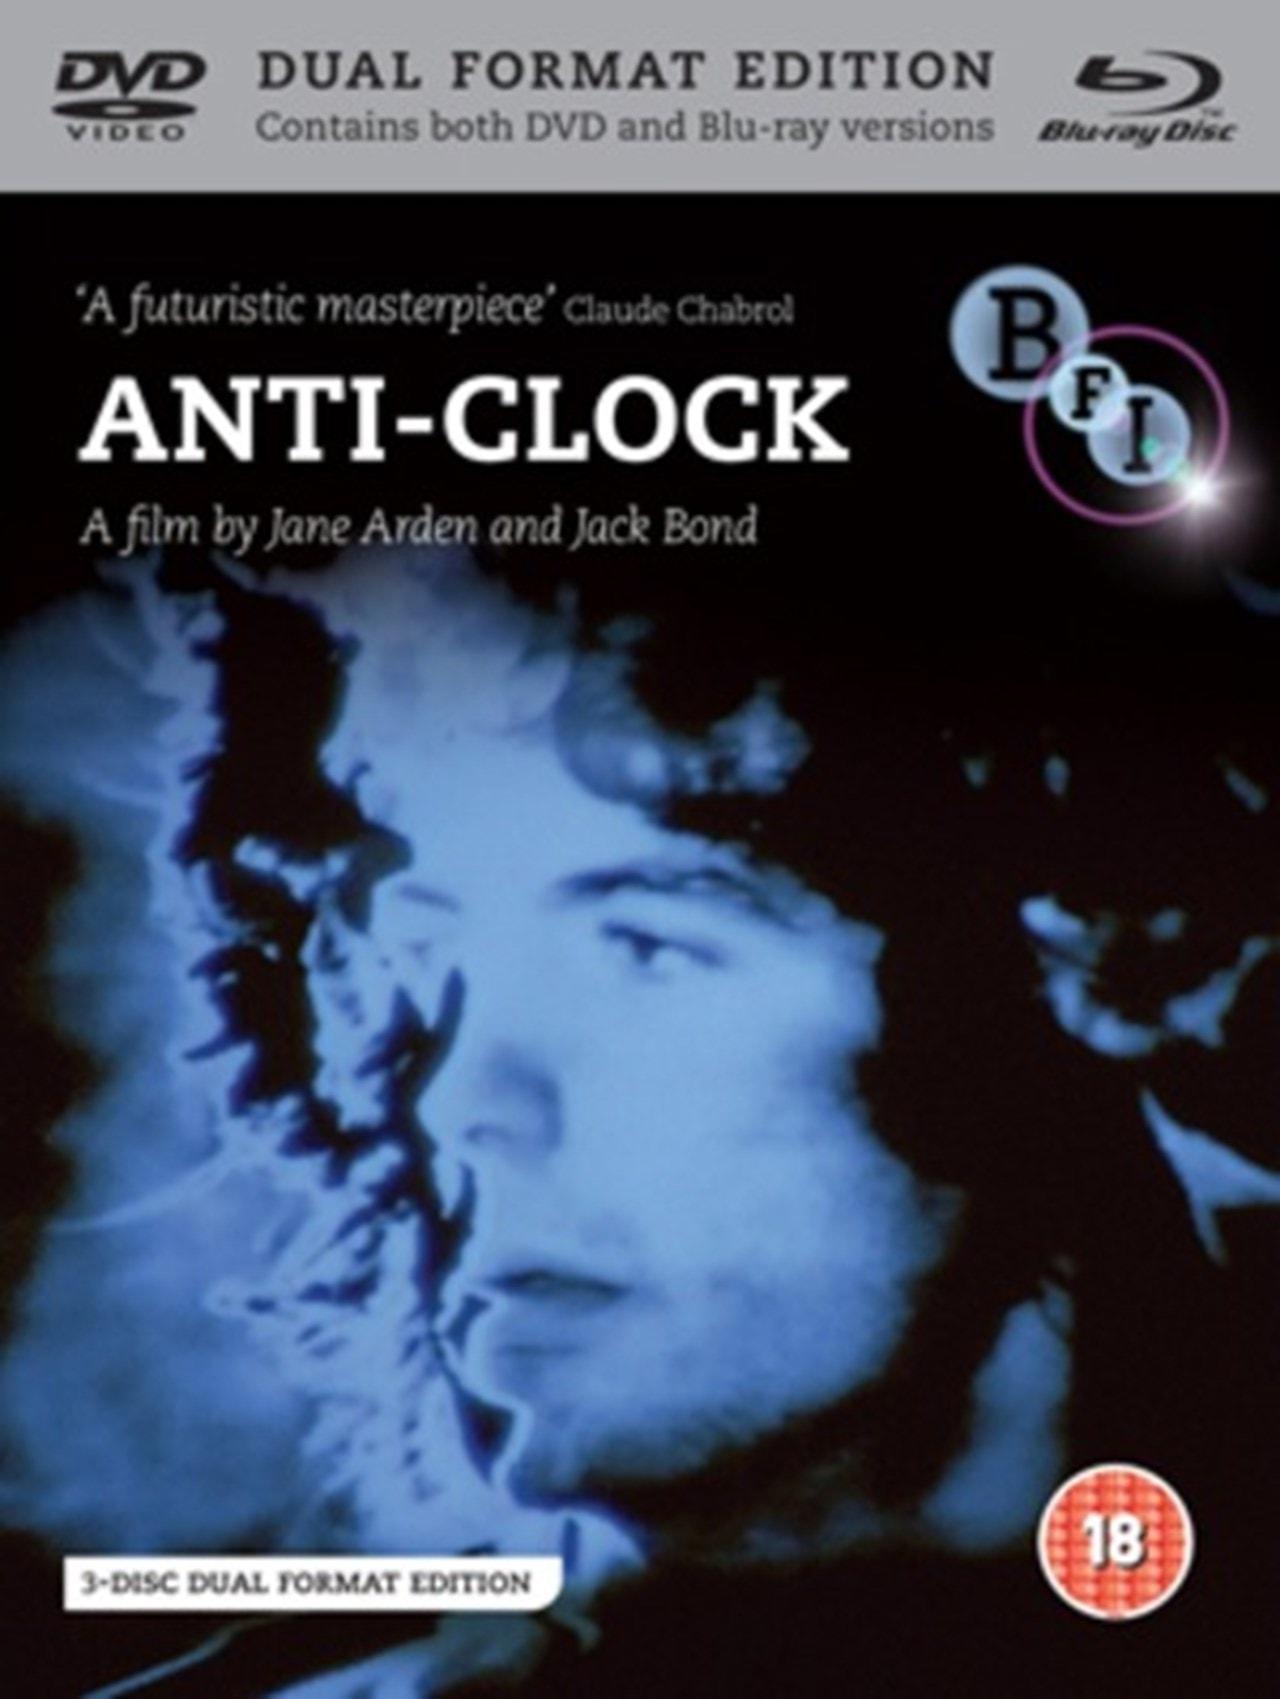 Anti-clock - 1